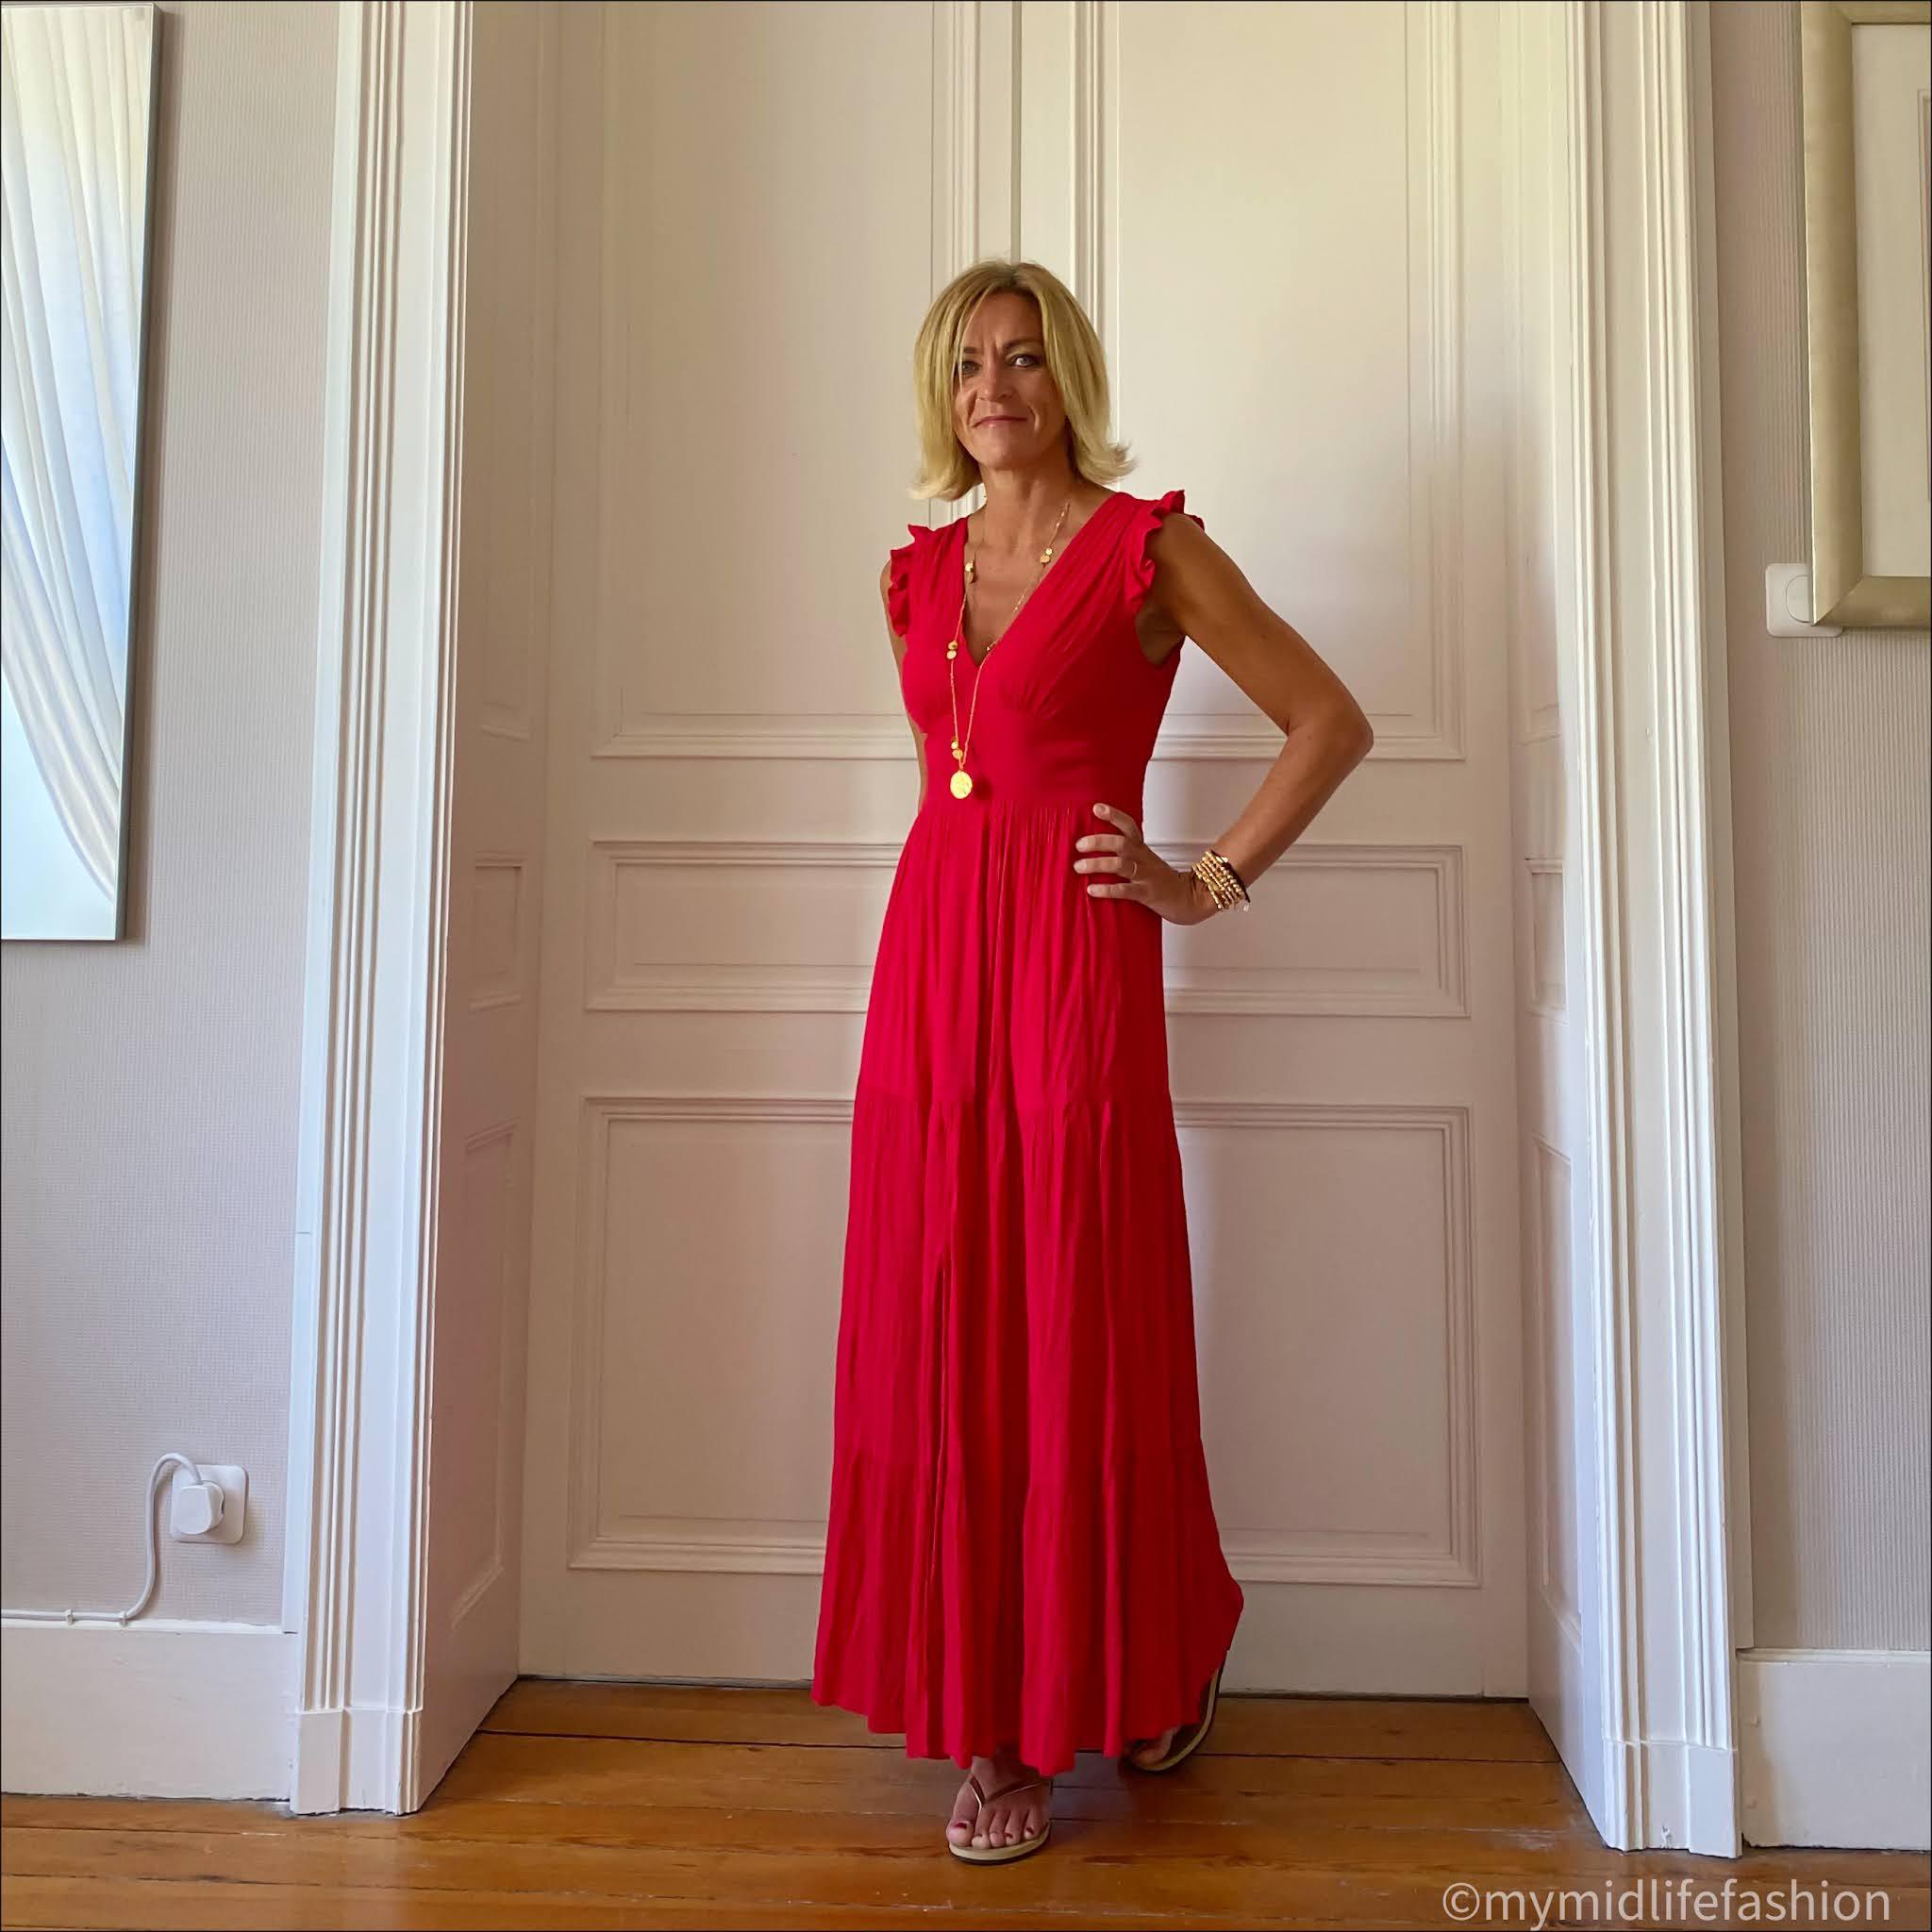 my midlife fashion, ashiana boho pendant necklace, Goa maxi dress, havaiana slim fit metallic gold flip flops